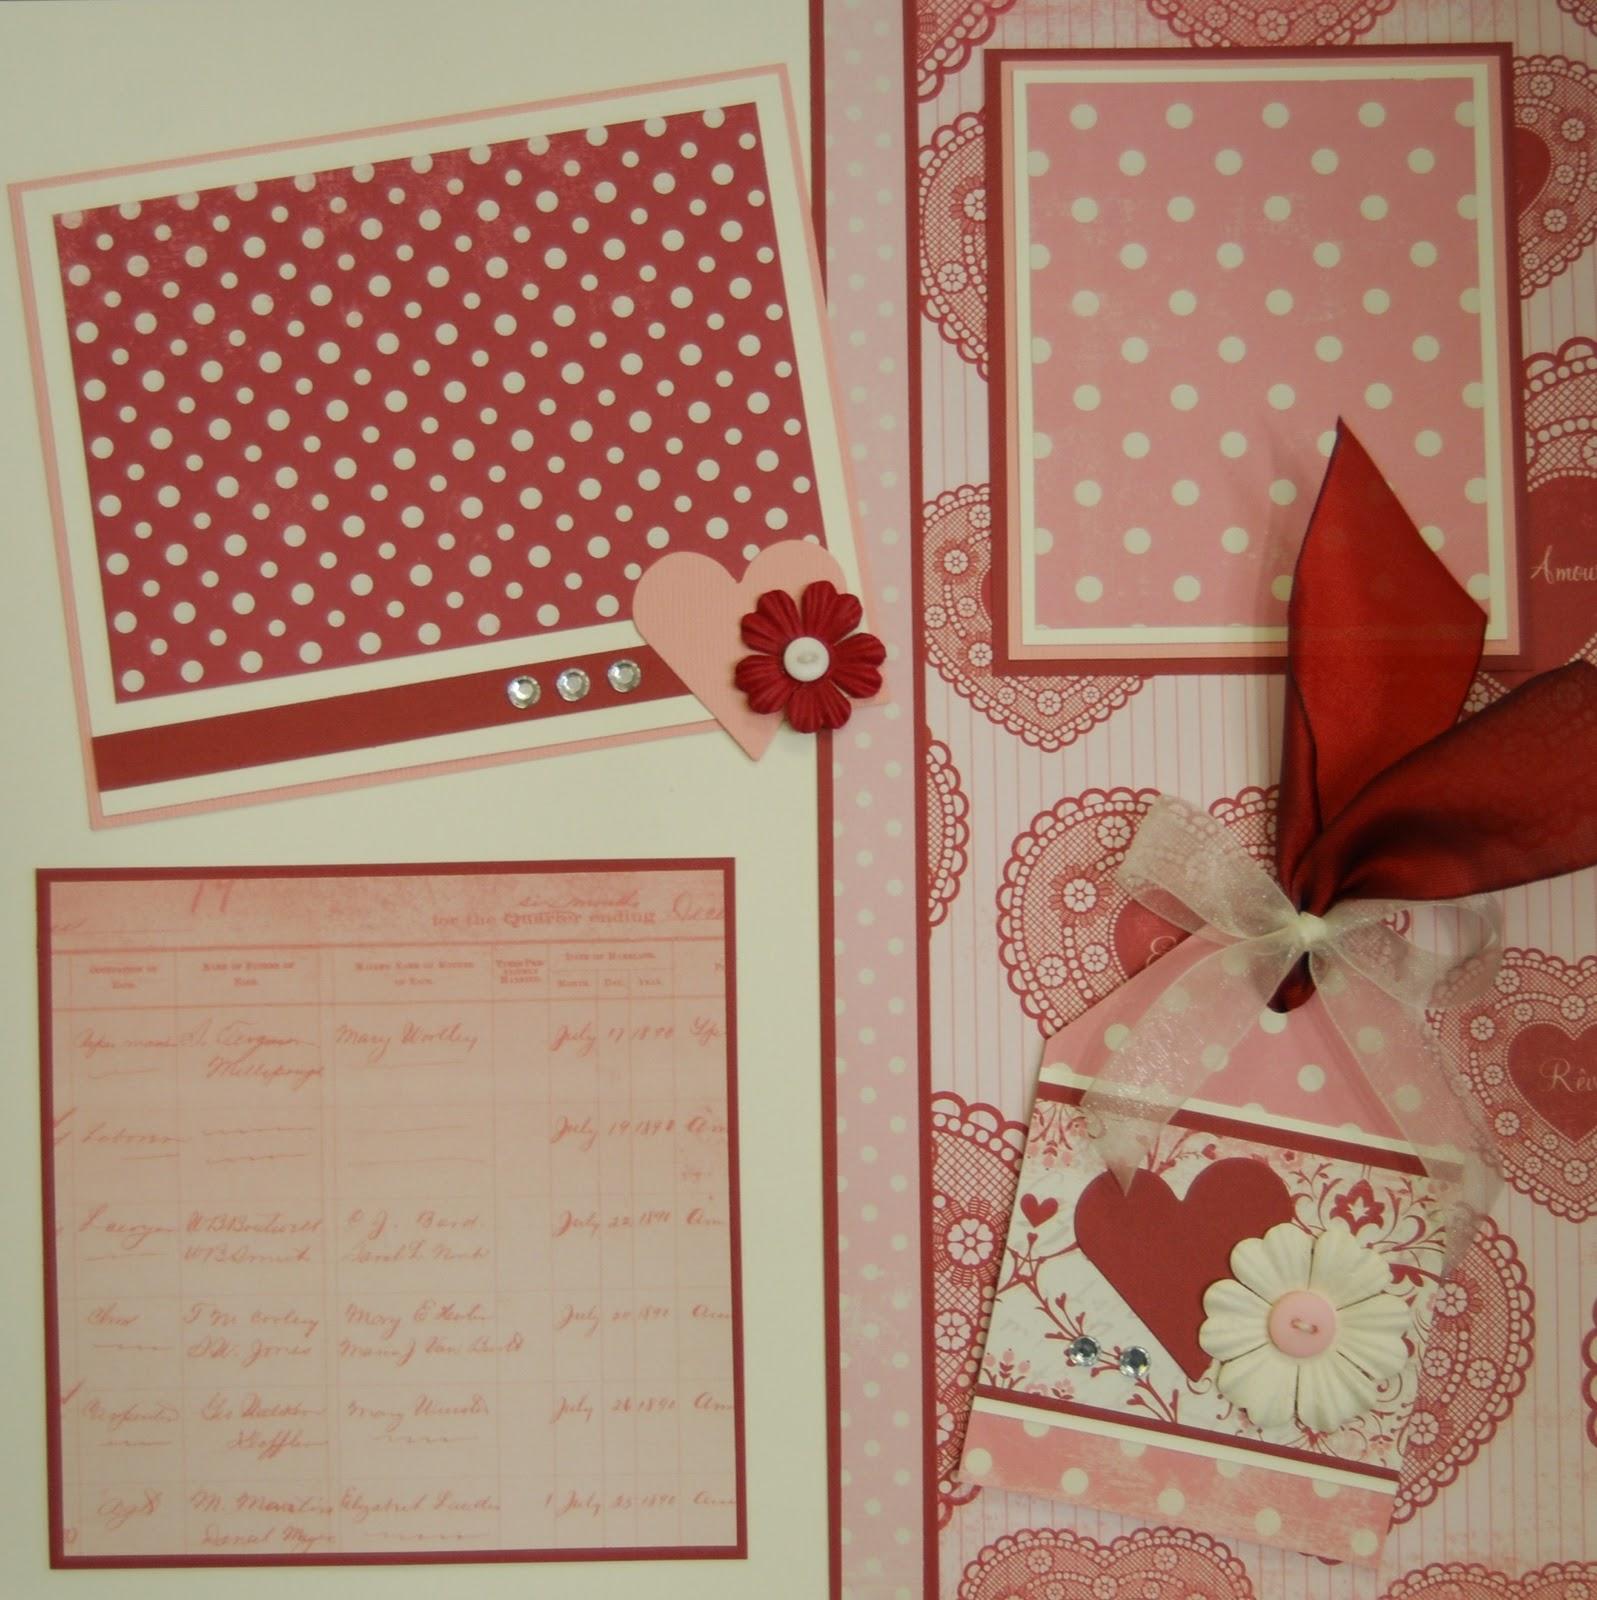 January scrapbook ideas - Valentine Page Kit